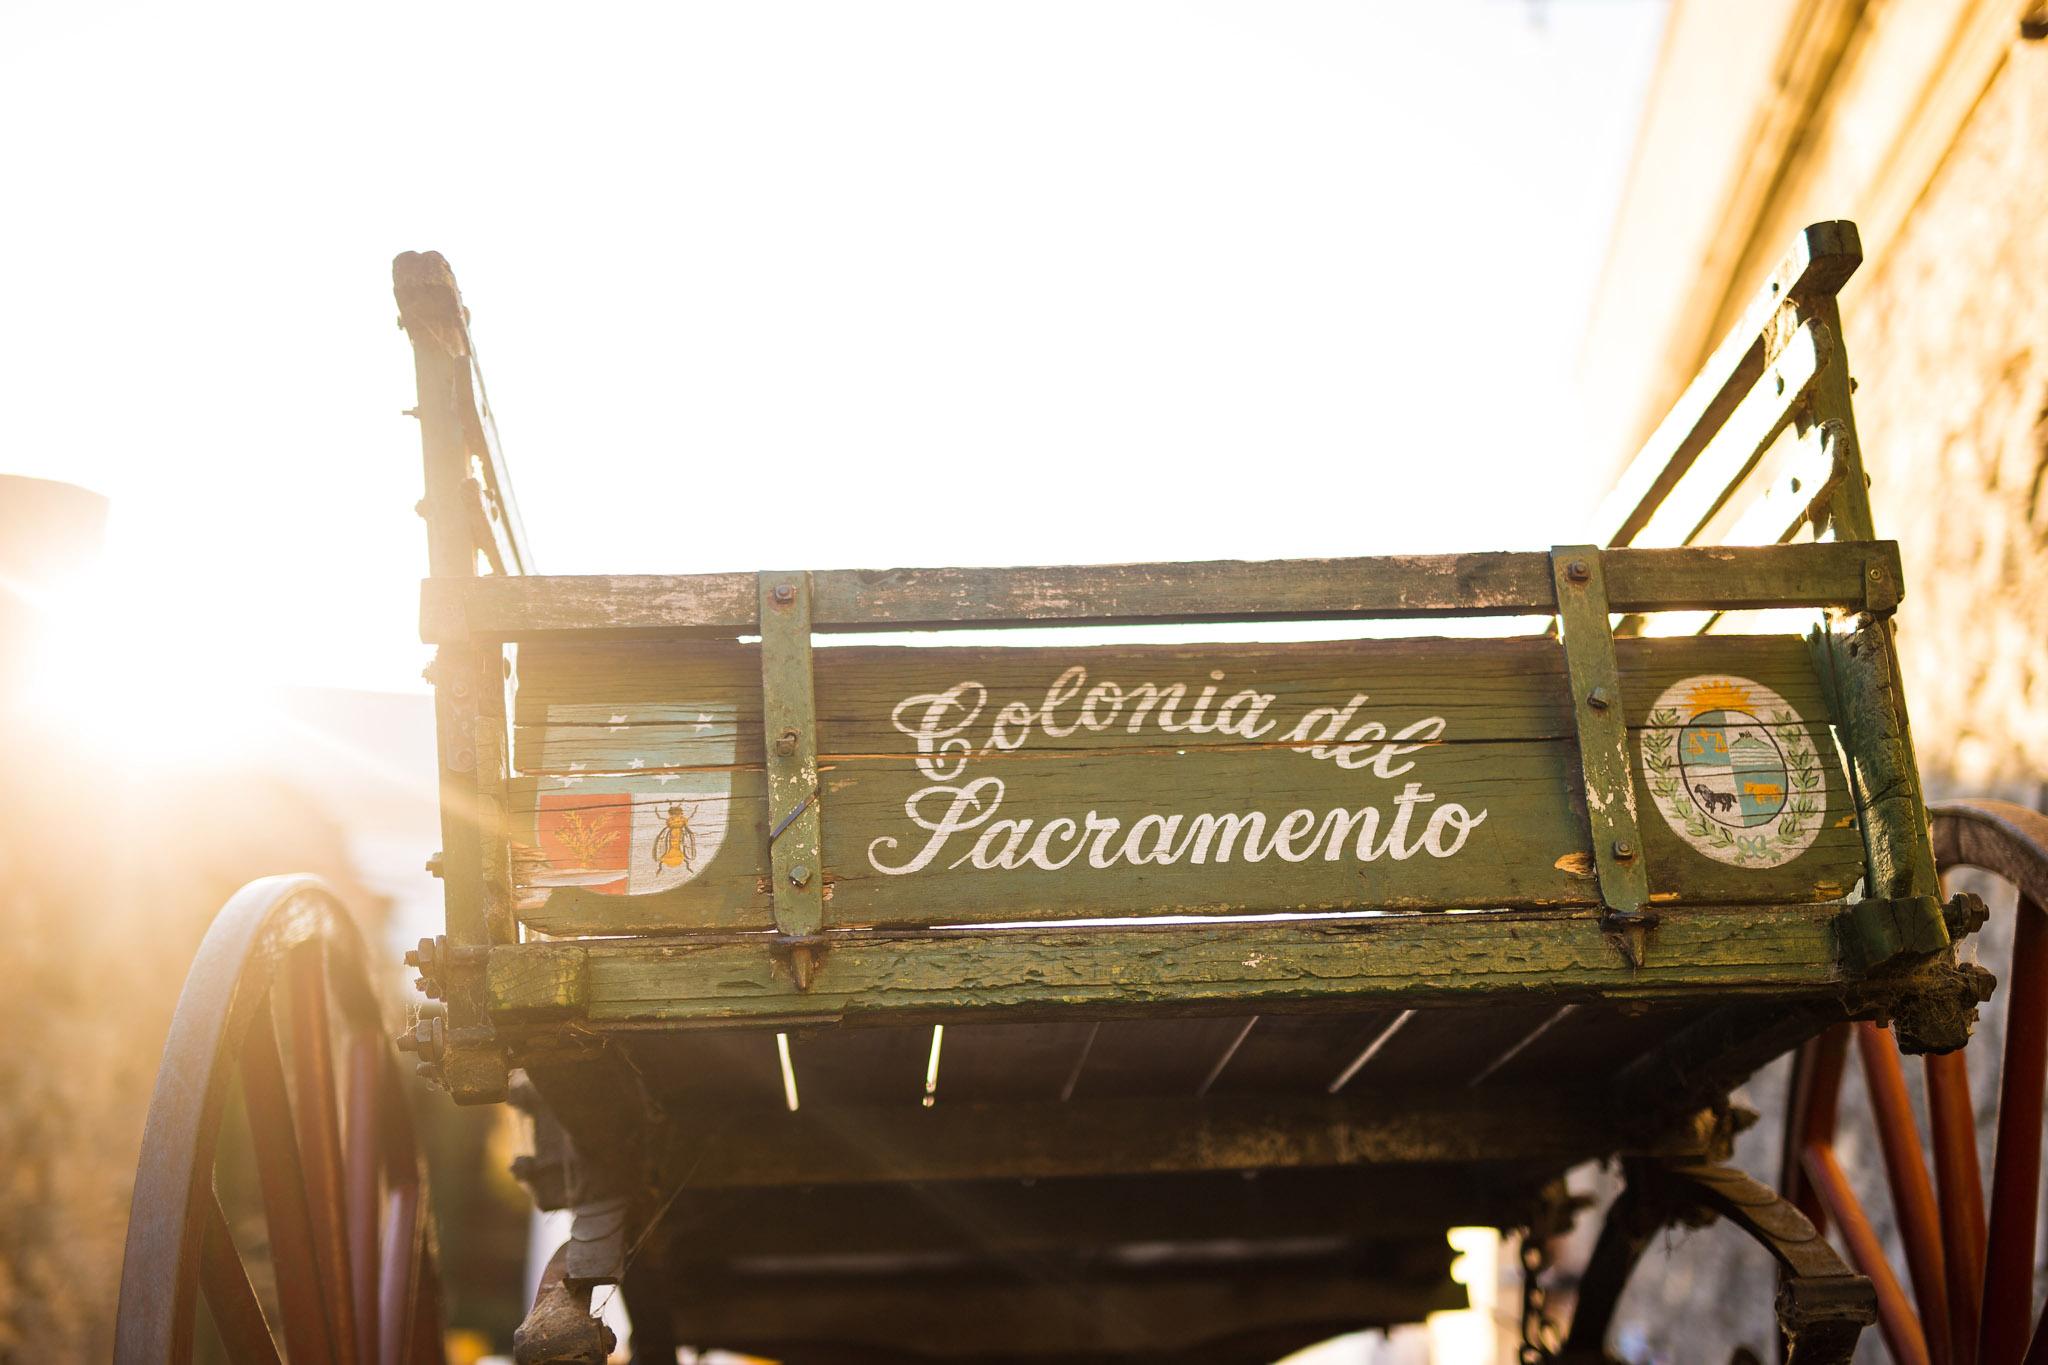 wedding-travellers-destination-photography-overlanding-south-america-uruguay-colonia-del-sacramento-cart-old-sun-shine